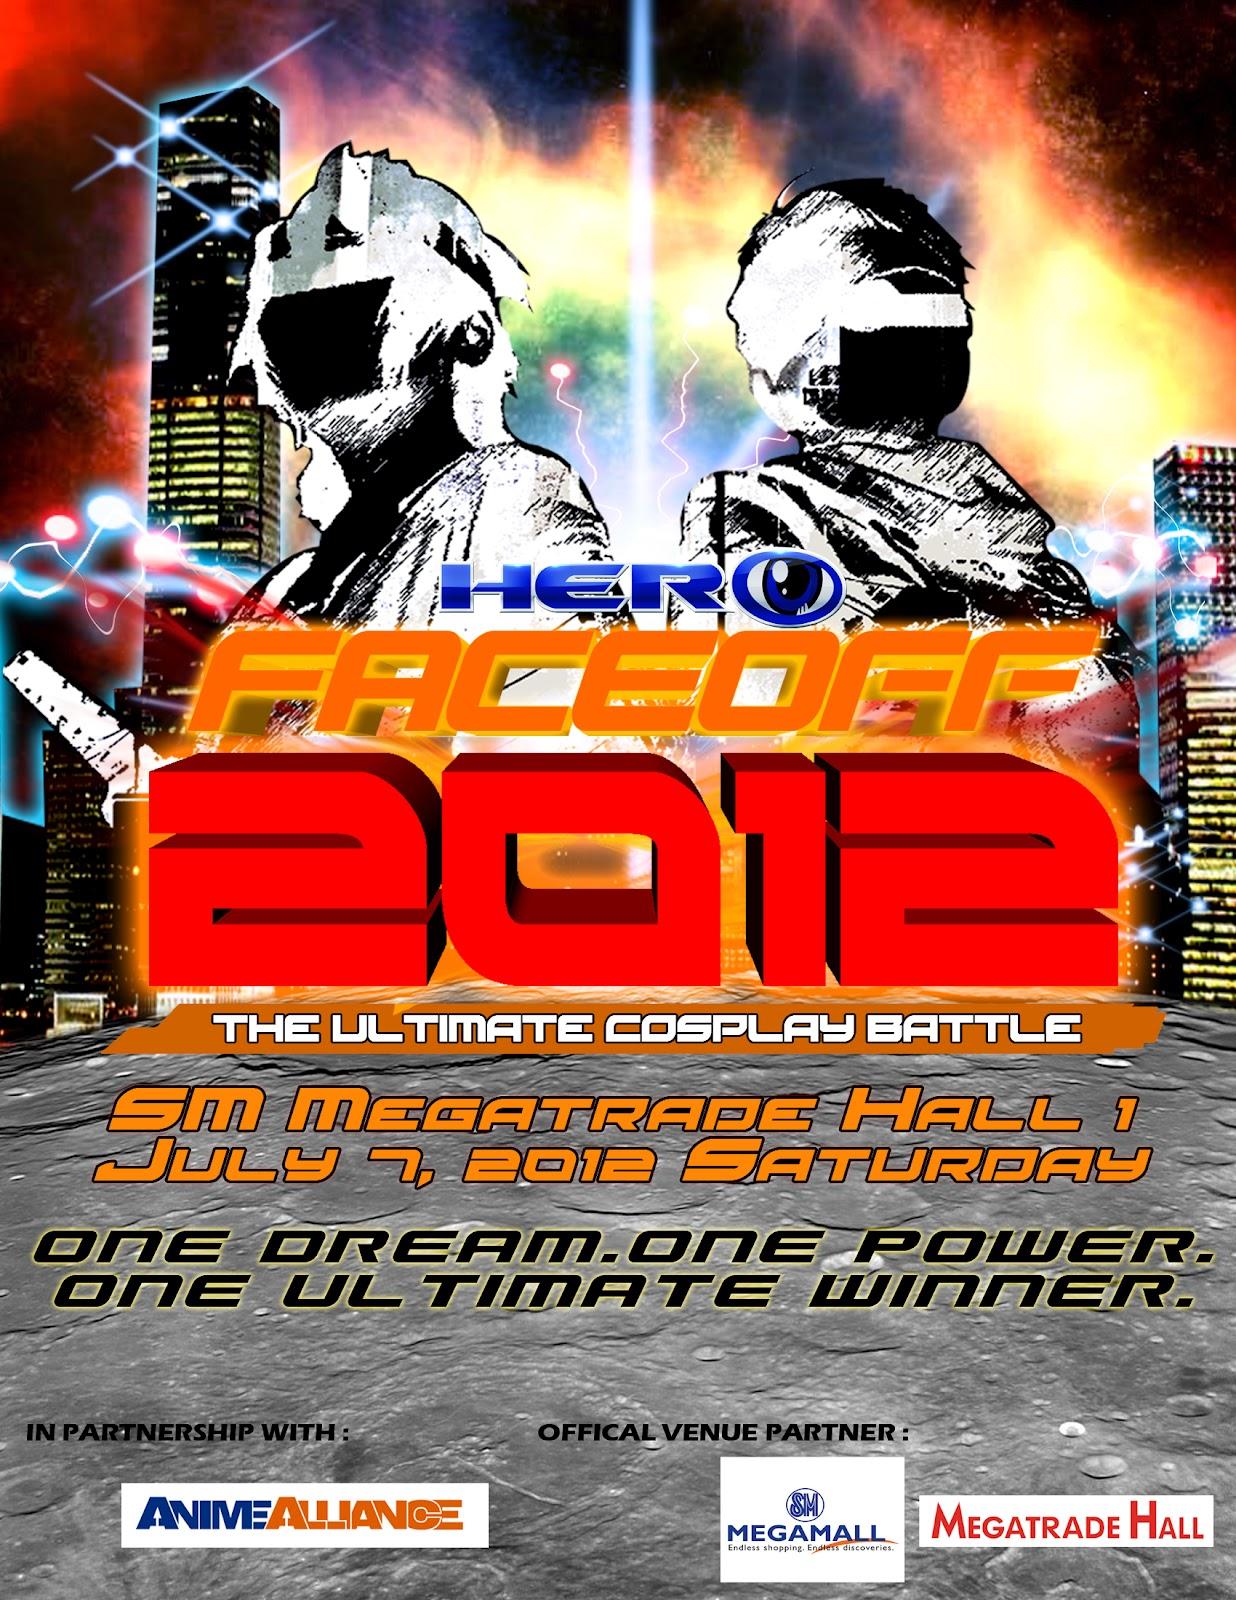 http://4.bp.blogspot.com/-hOjWzpUI2GY/T7xJEyQ7wLI/AAAAAAAAAOw/3Lwvnxp7mls/s1600/hero+face+off+2012.jpg